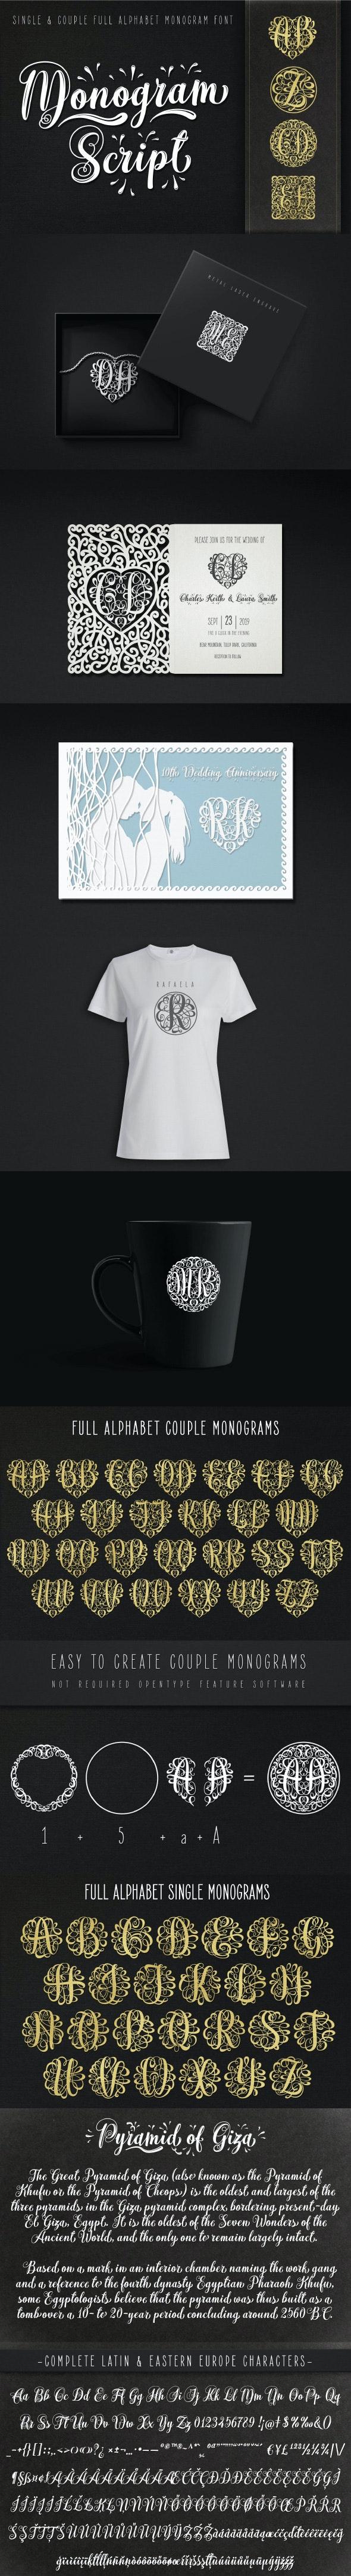 Monogram Script | Full Alphabet Single & Couple Monograms - Calligraphy Script